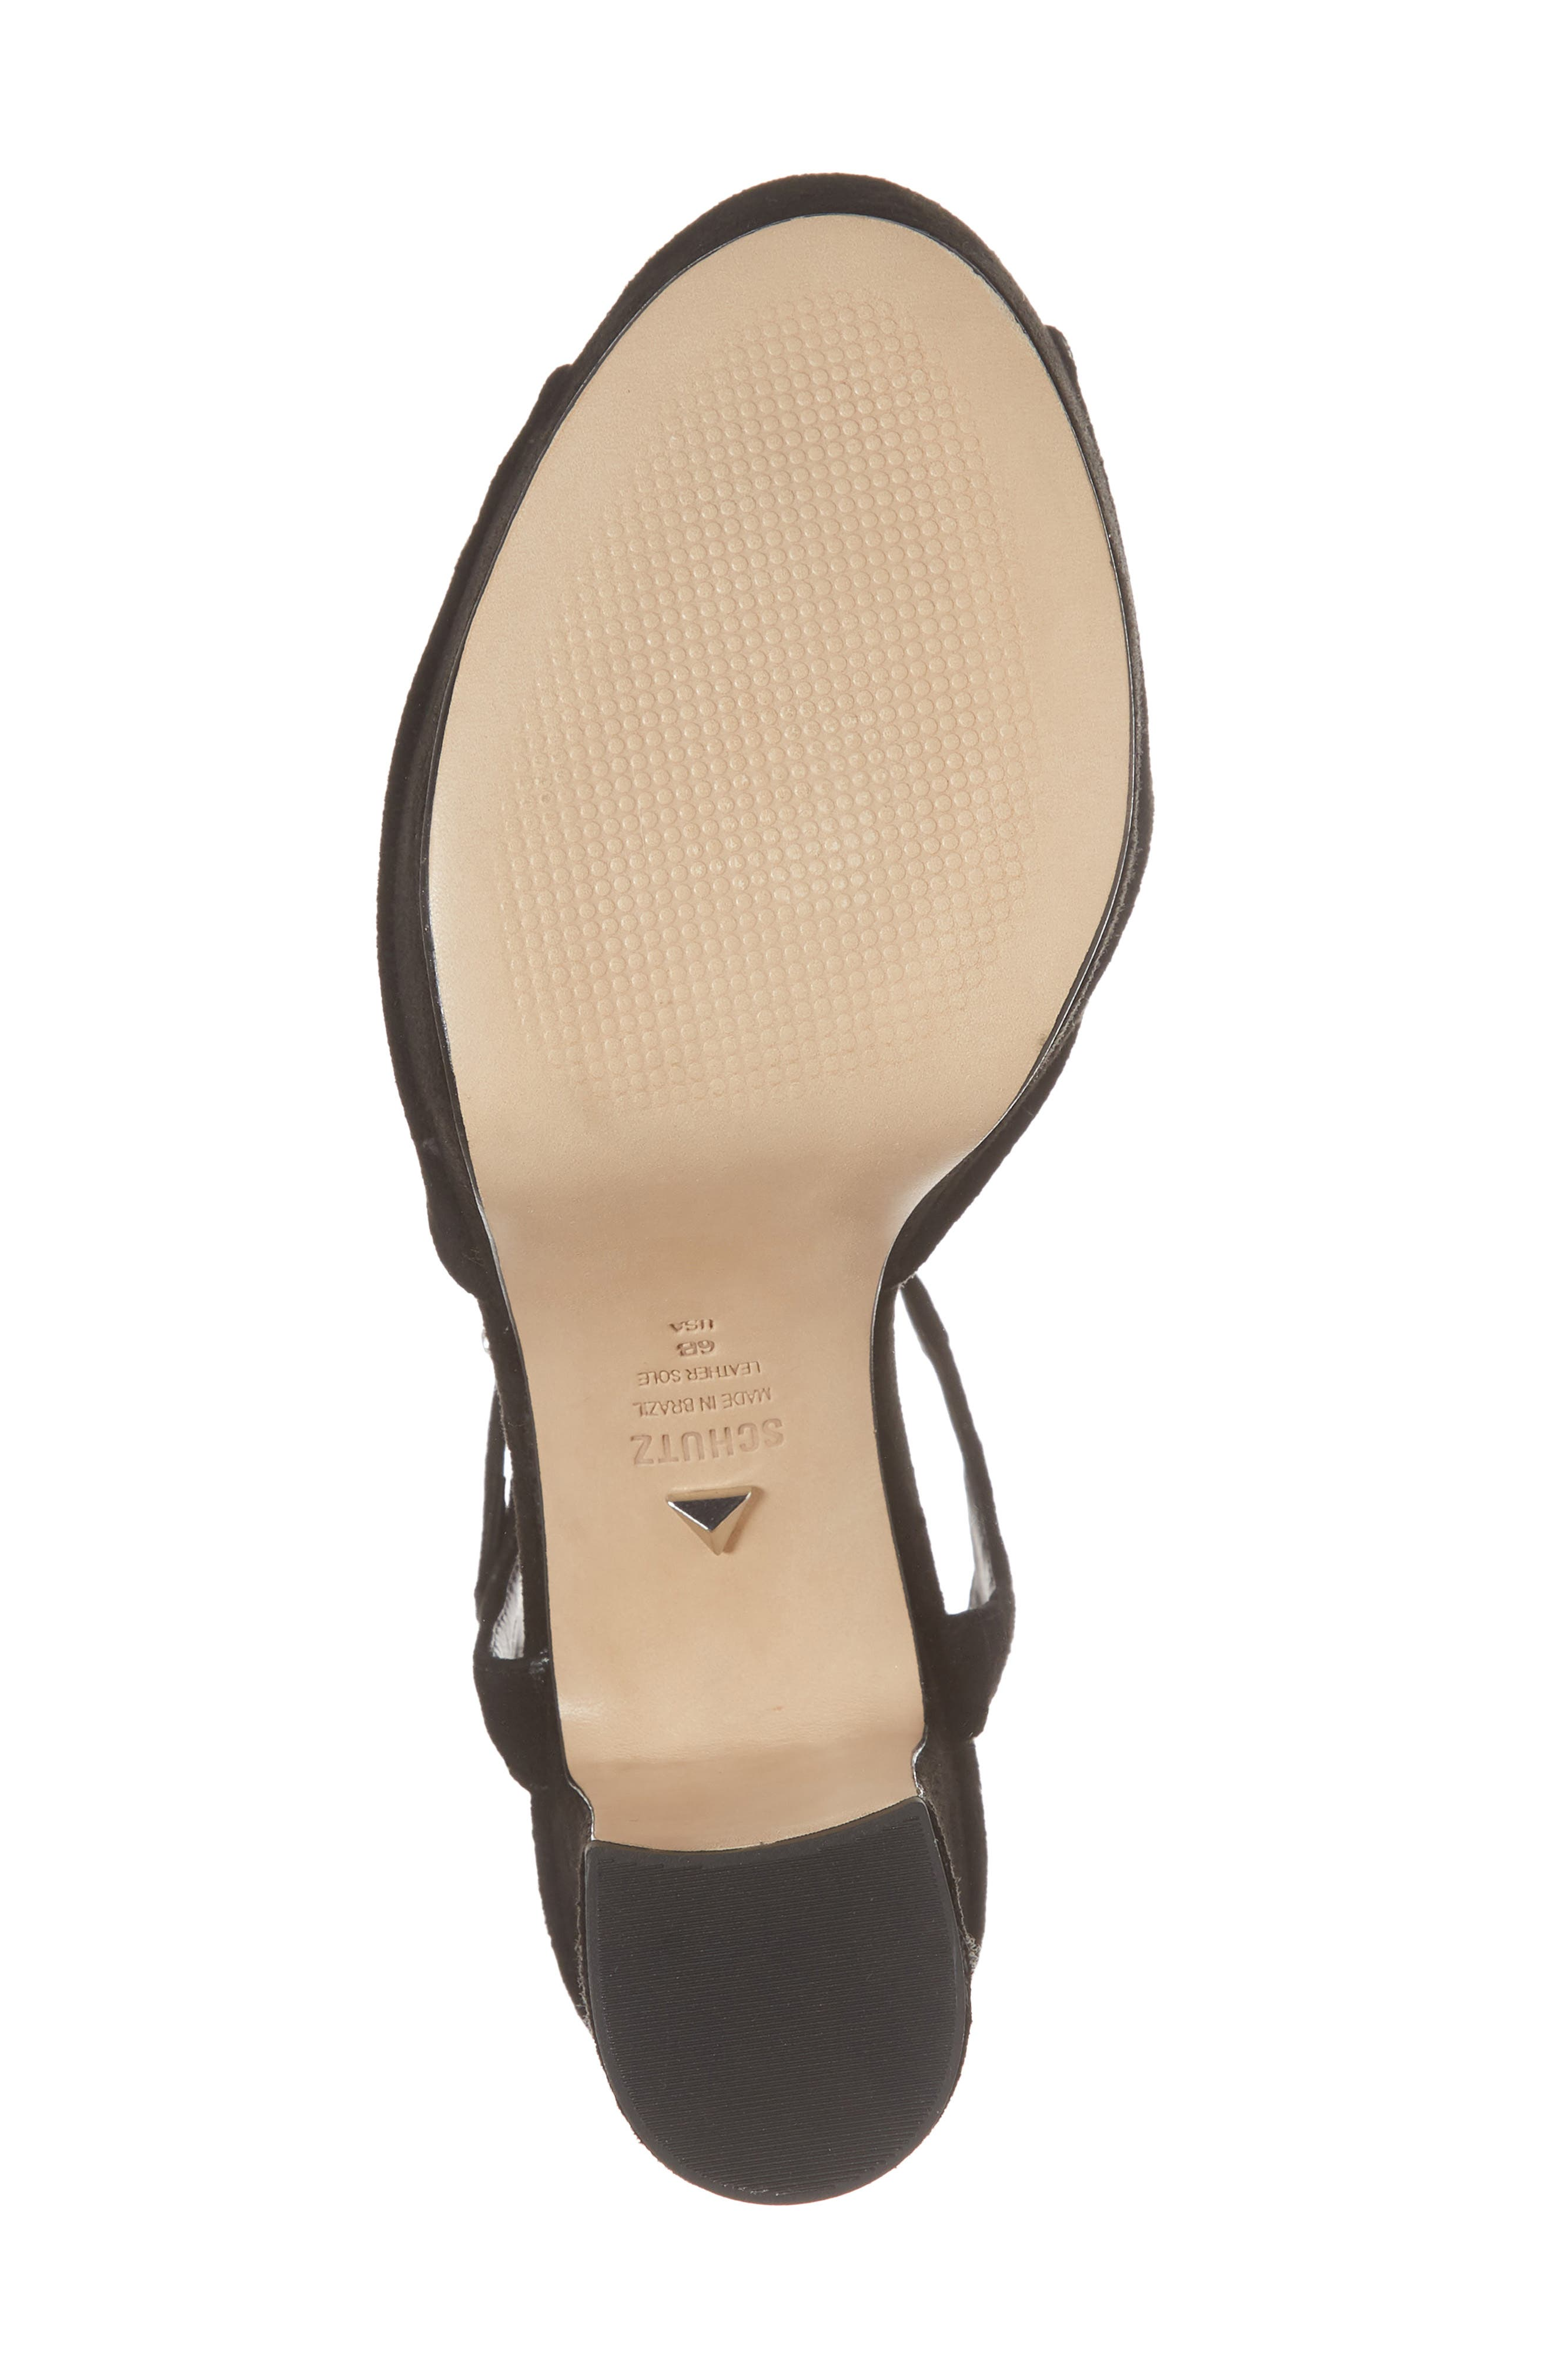 Thalyta Platform Sandal,                             Alternate thumbnail 6, color,                             001